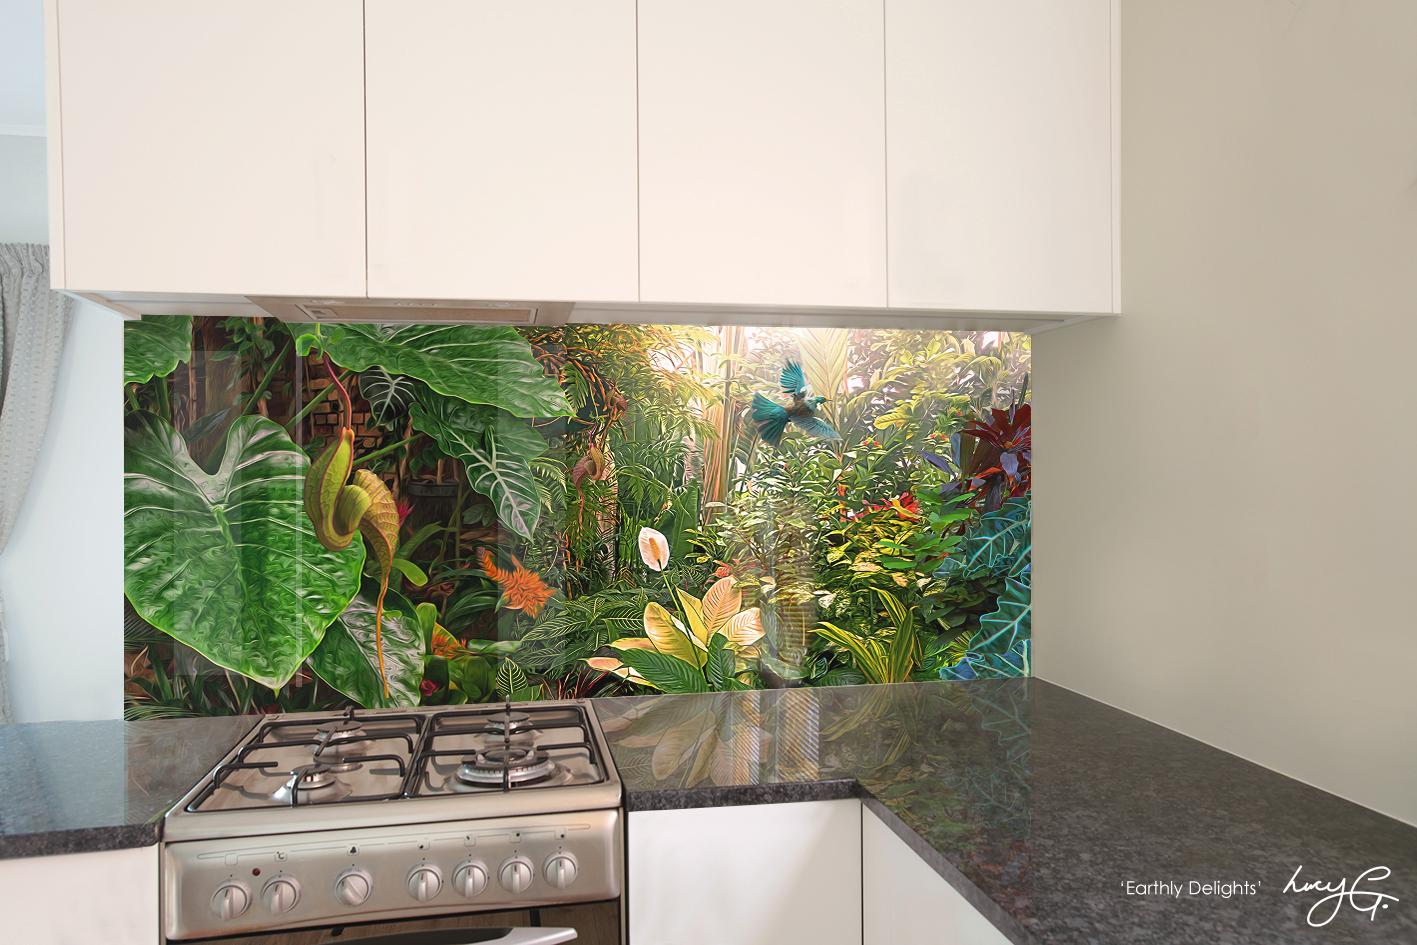 'Earthly Delights' printed image on glass splashback